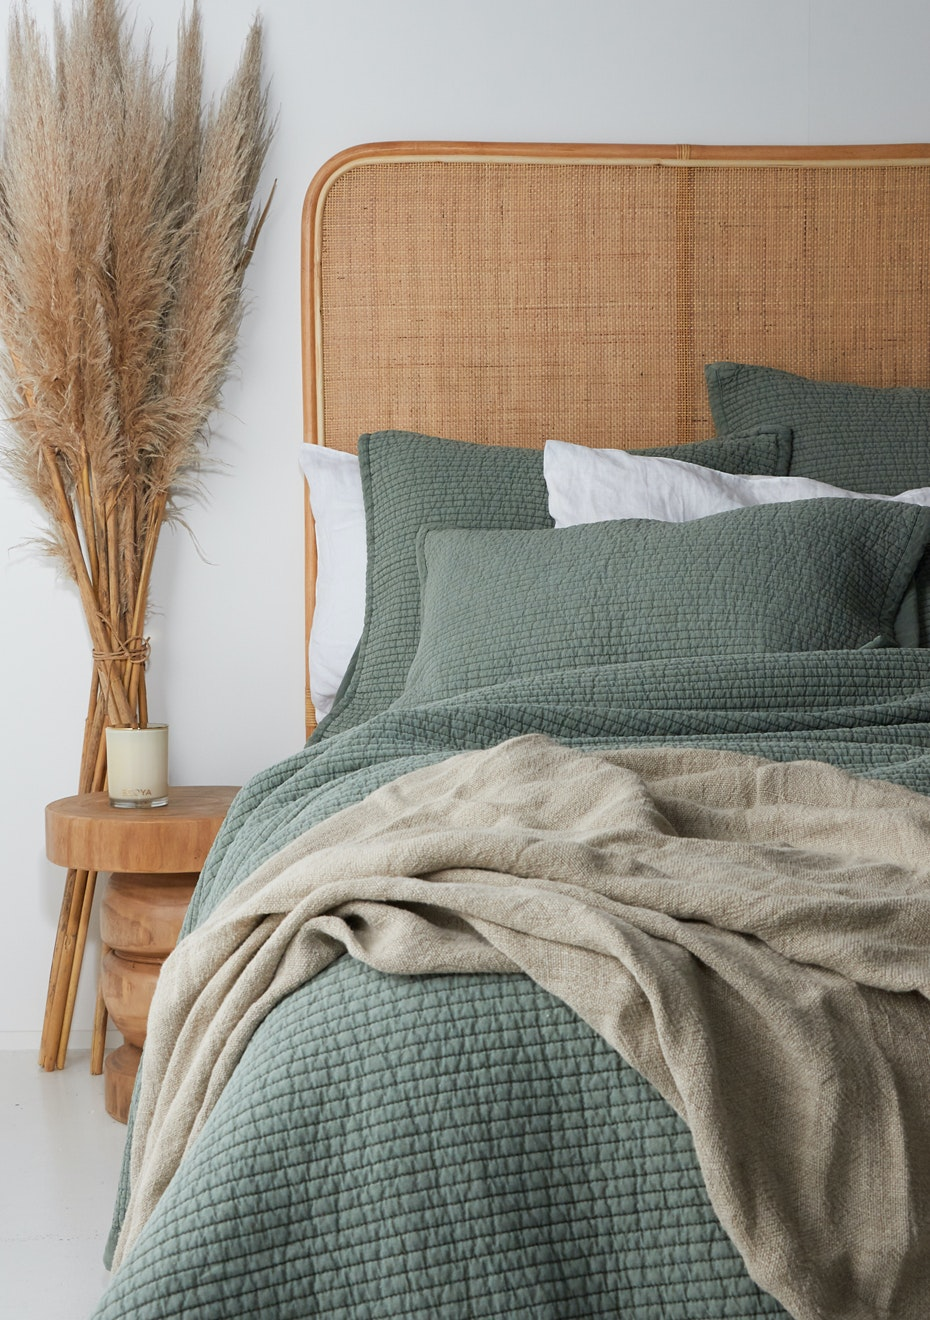 Quilted Vintage Linen Cotton Duvet Set Queen Khaki New Season Quilted Vintage Washed Duvet Cover Sets Onceit